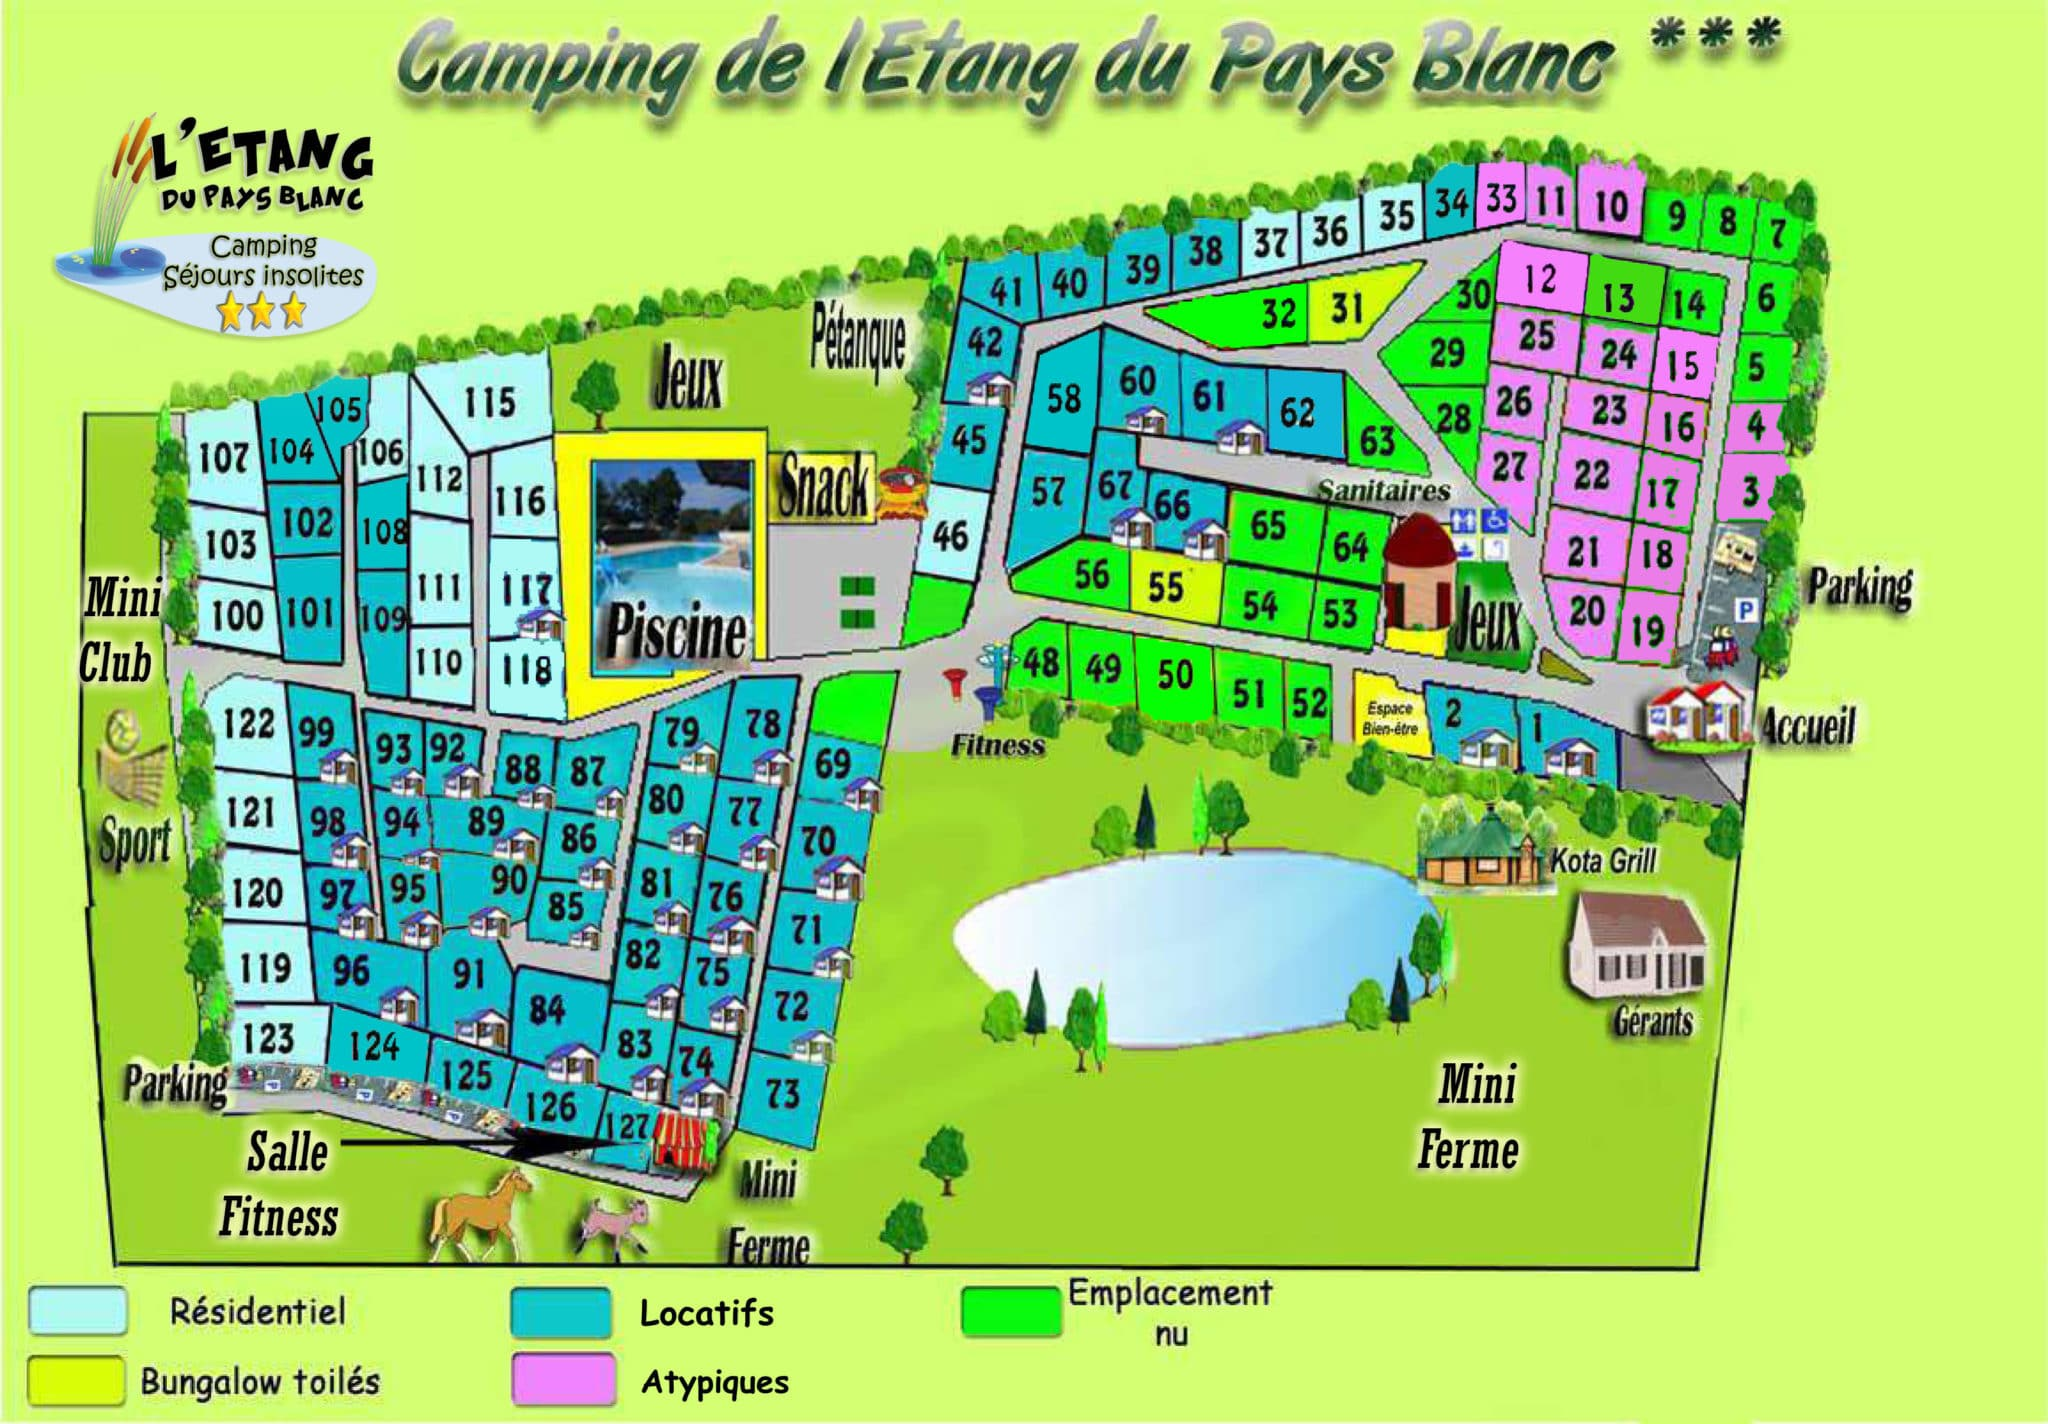 PLAN camping de l etang 2021